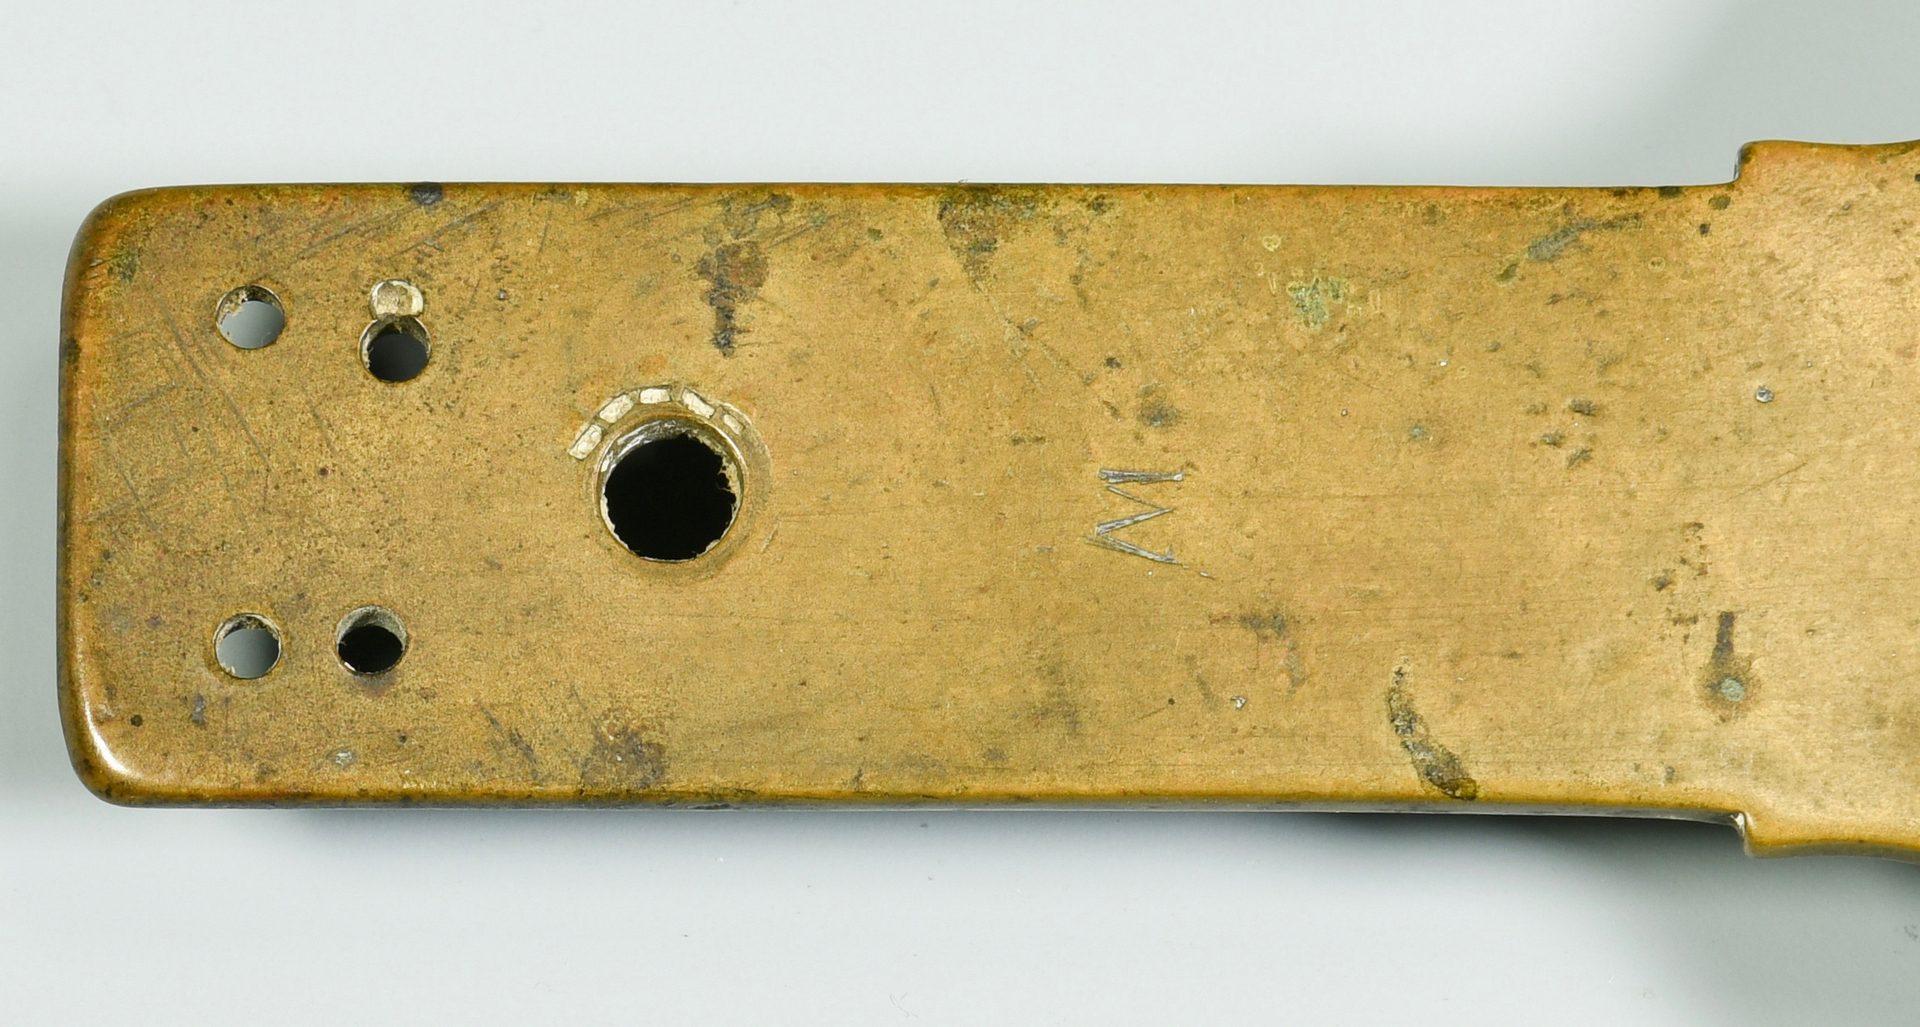 Lot 257: John Davis's Brass Surveyor Compass and Scale